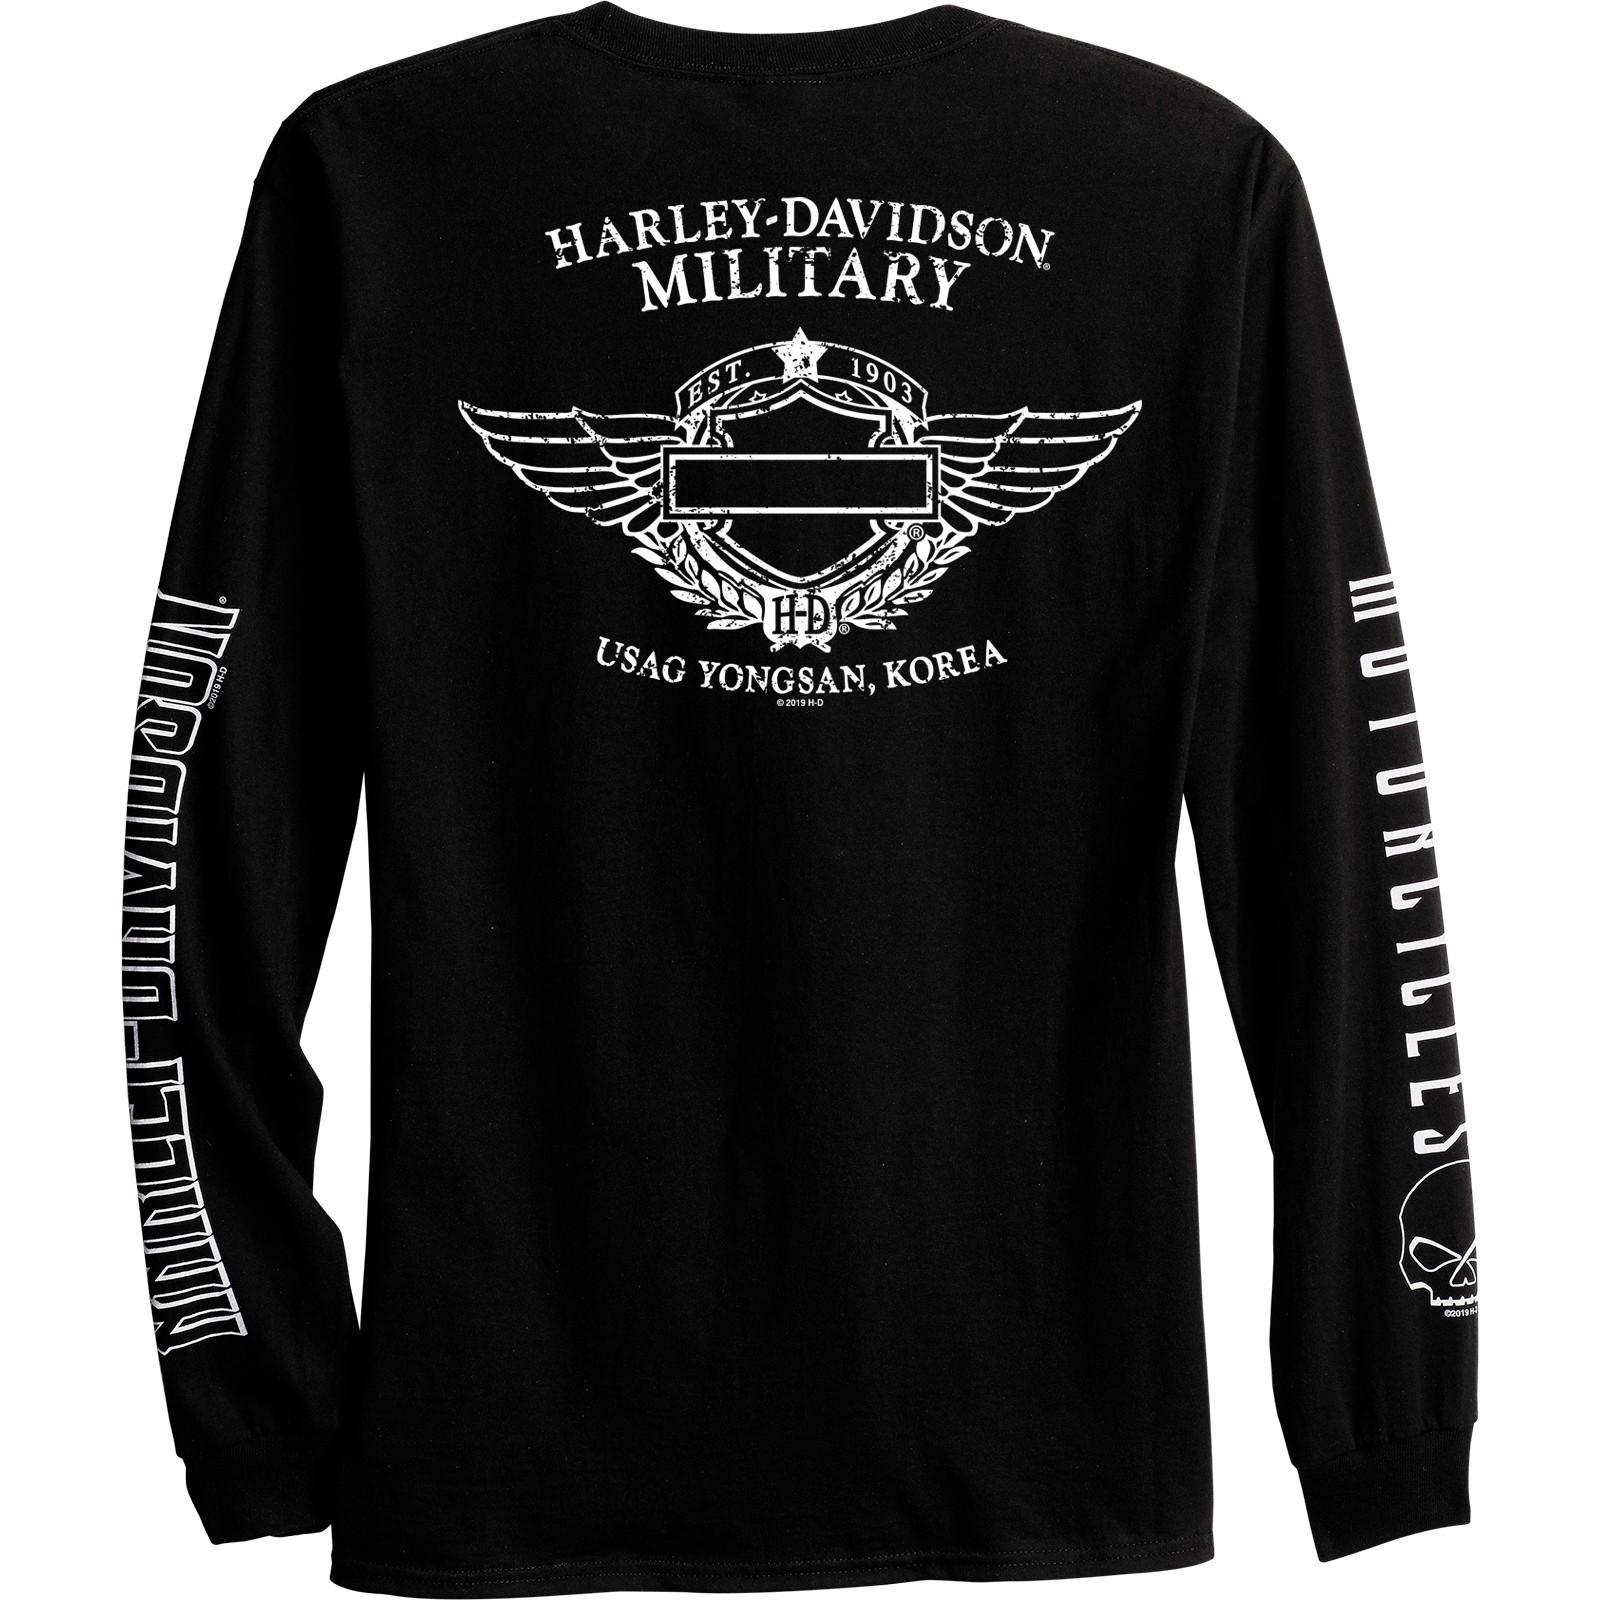 Harley-Davidson Men/'s Long-Sleeve Graphic Tee USAG YongsanArch G